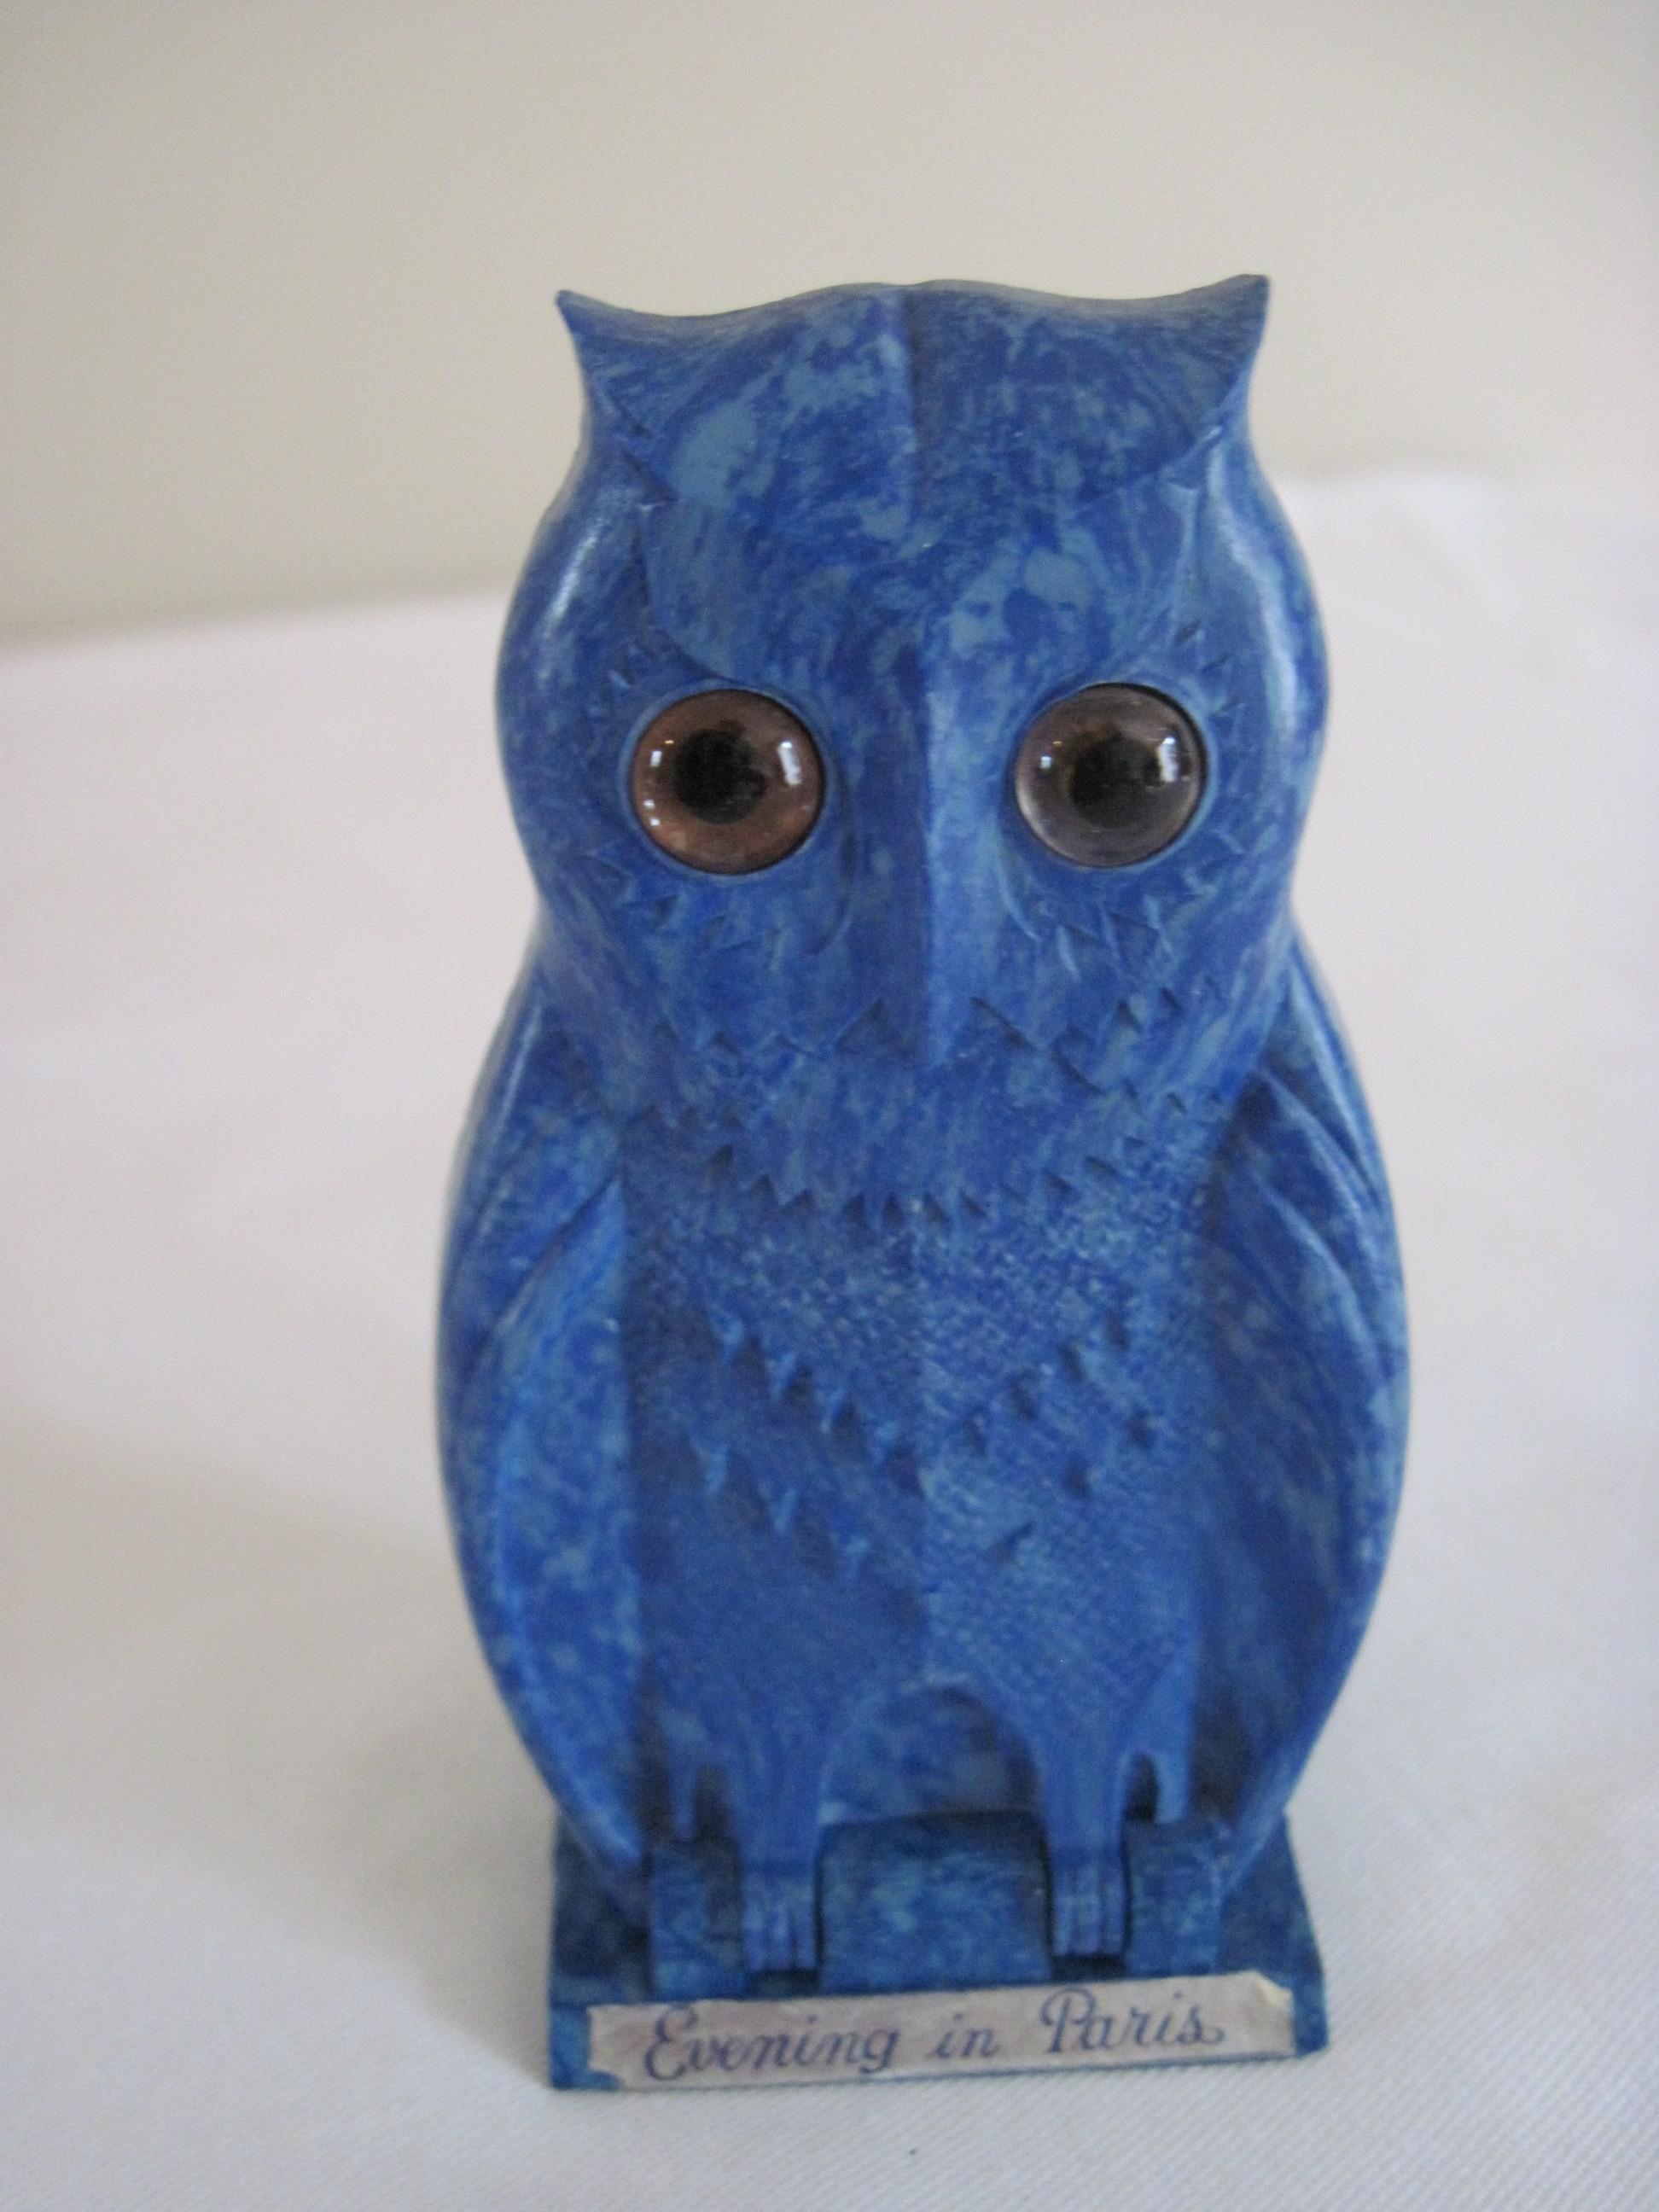 Bakelite Owl Perfume Holder For Evening In Paris Ca 1930